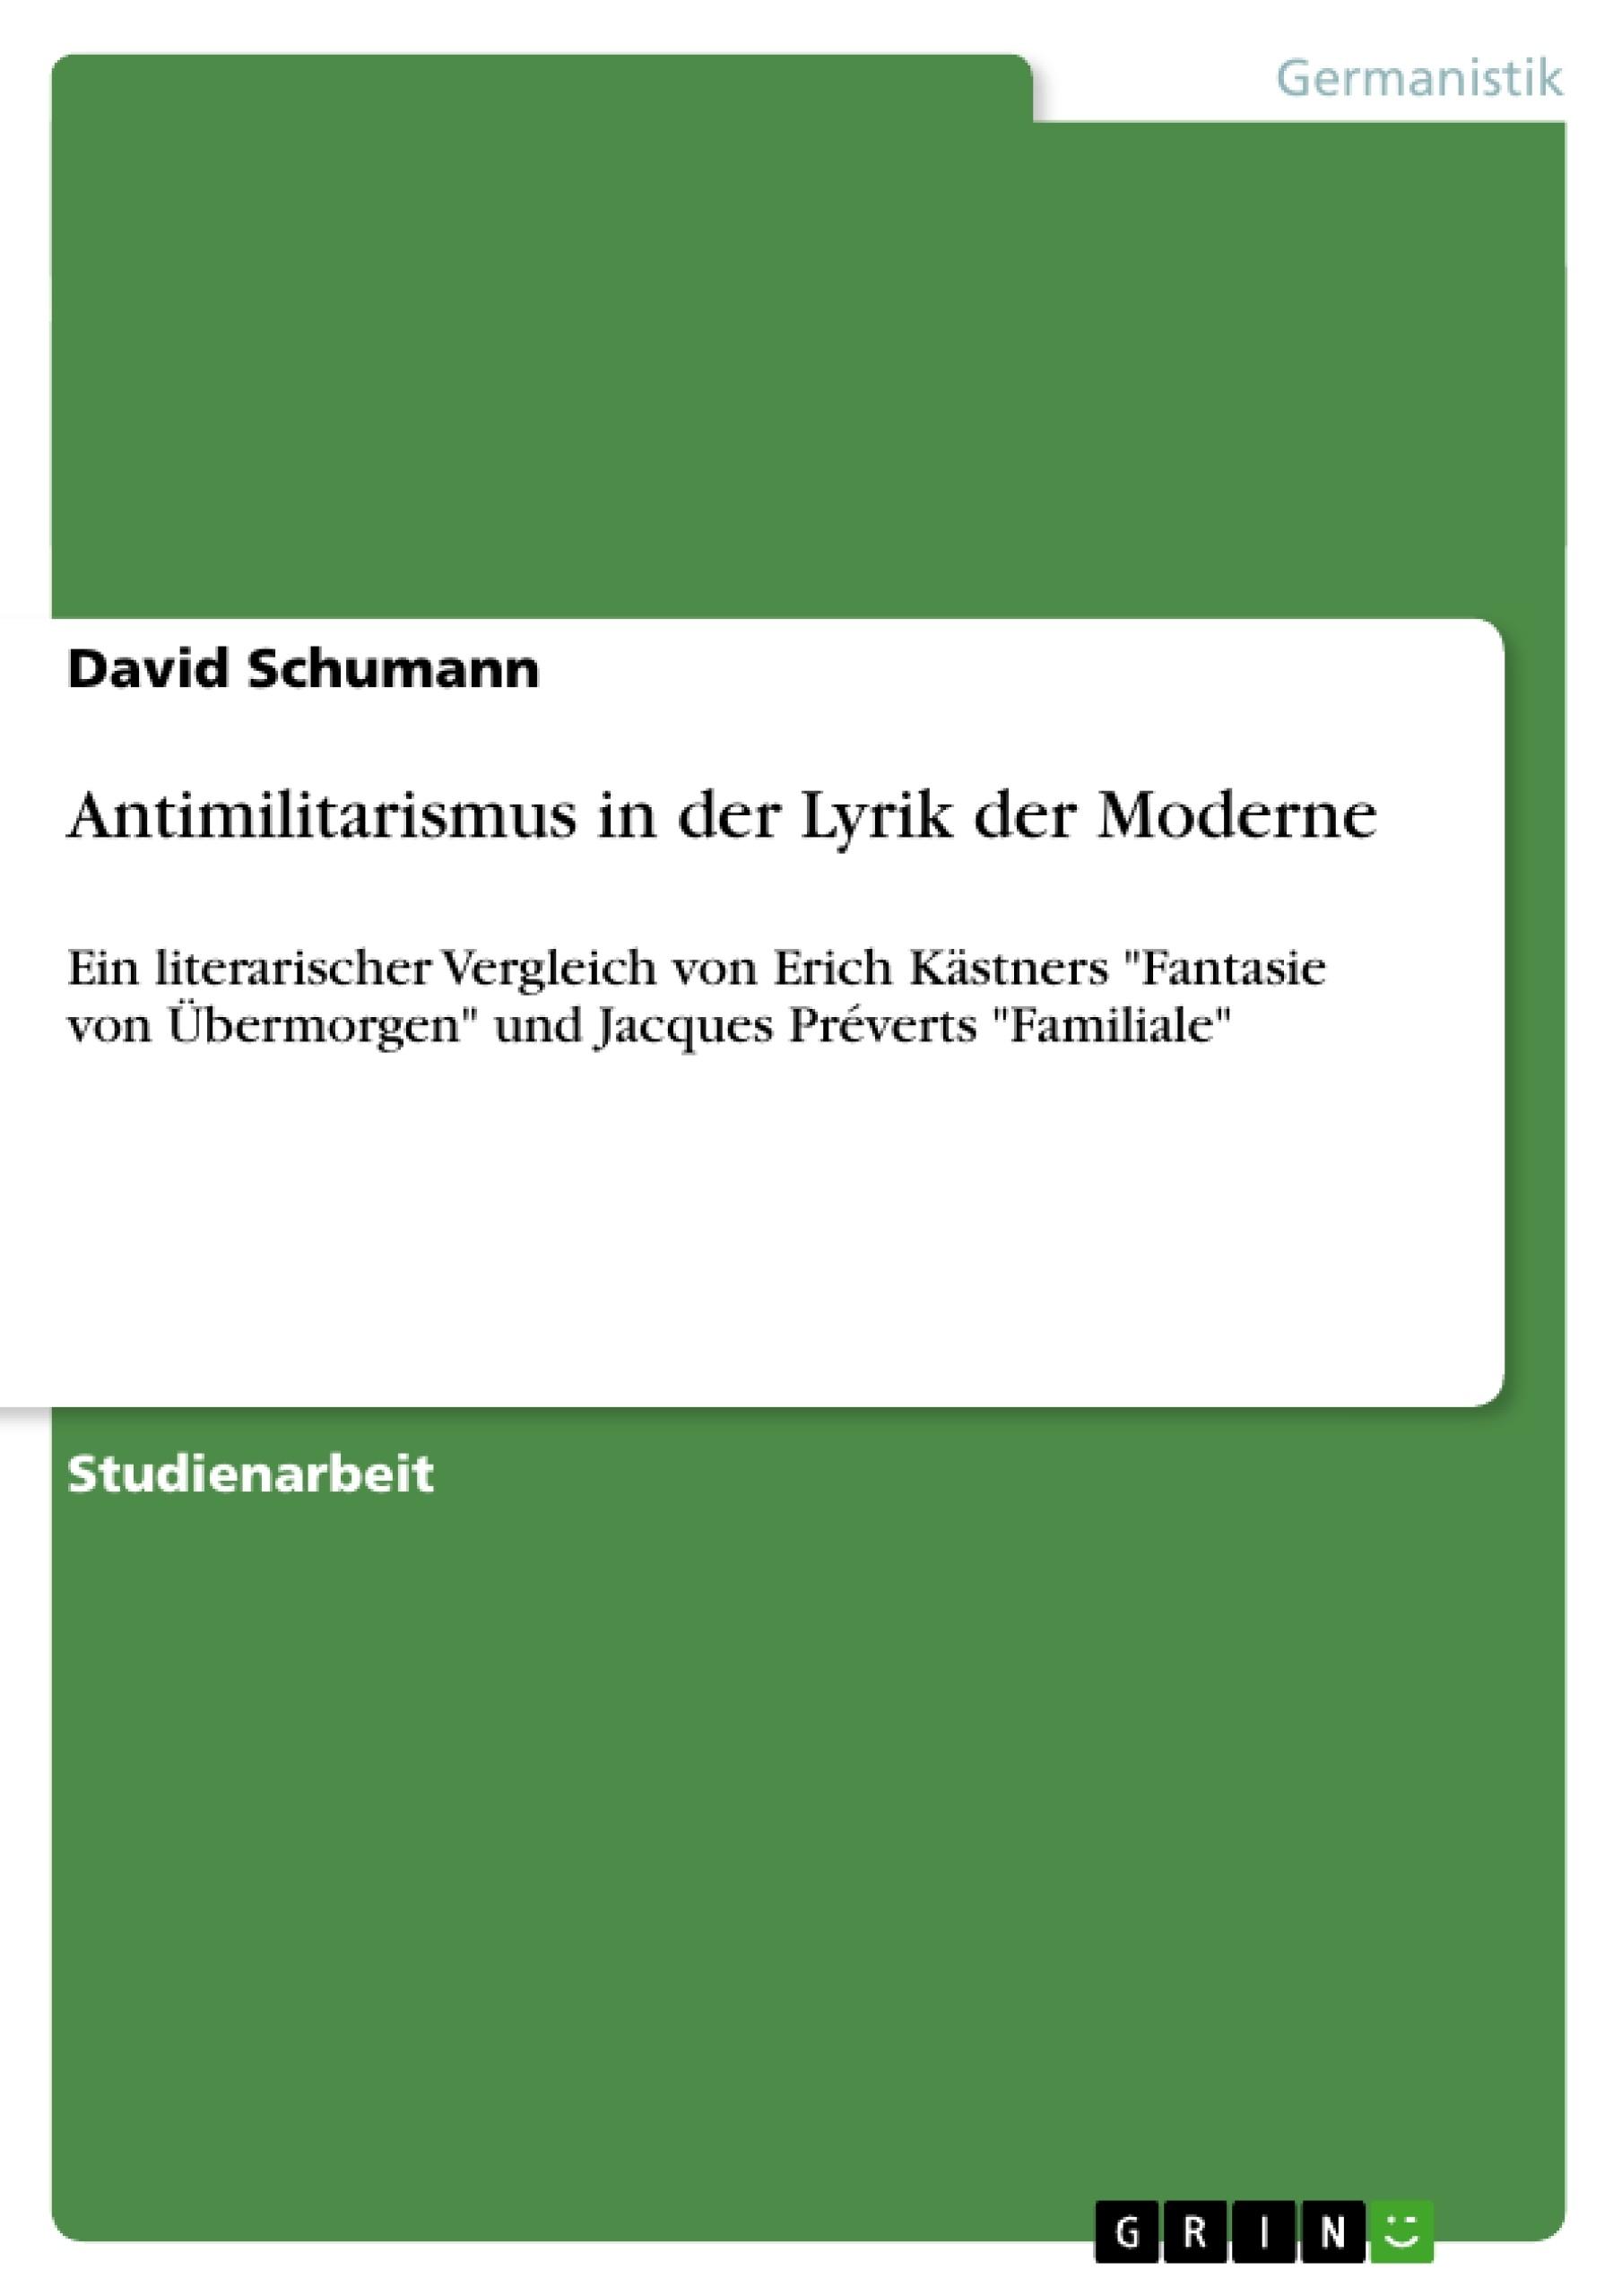 Titel: Antimilitarismus in der Lyrik der Moderne